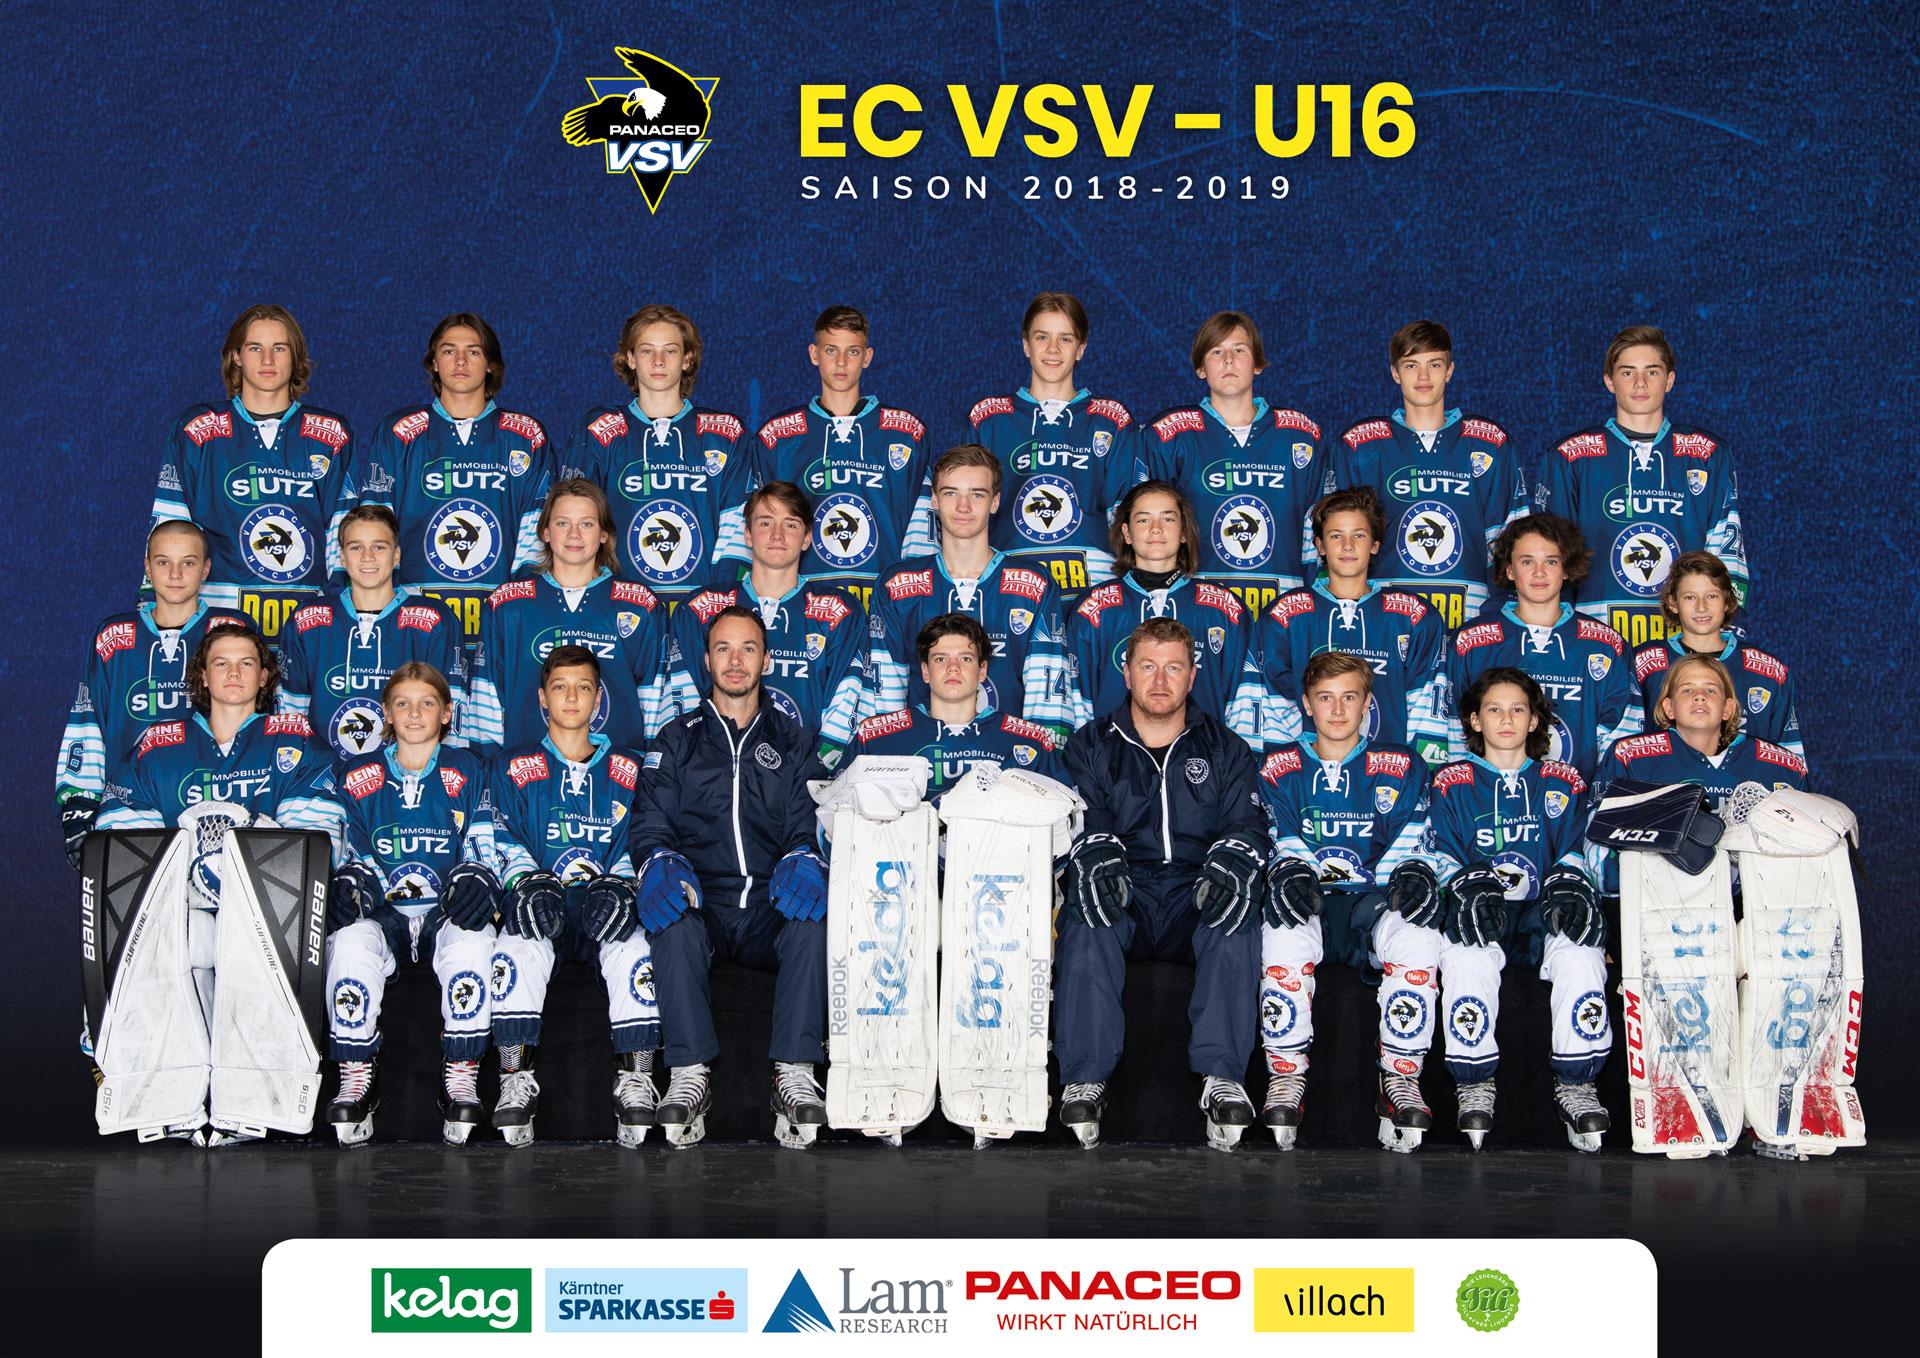 EC PANACEO VSV U16 2018-19